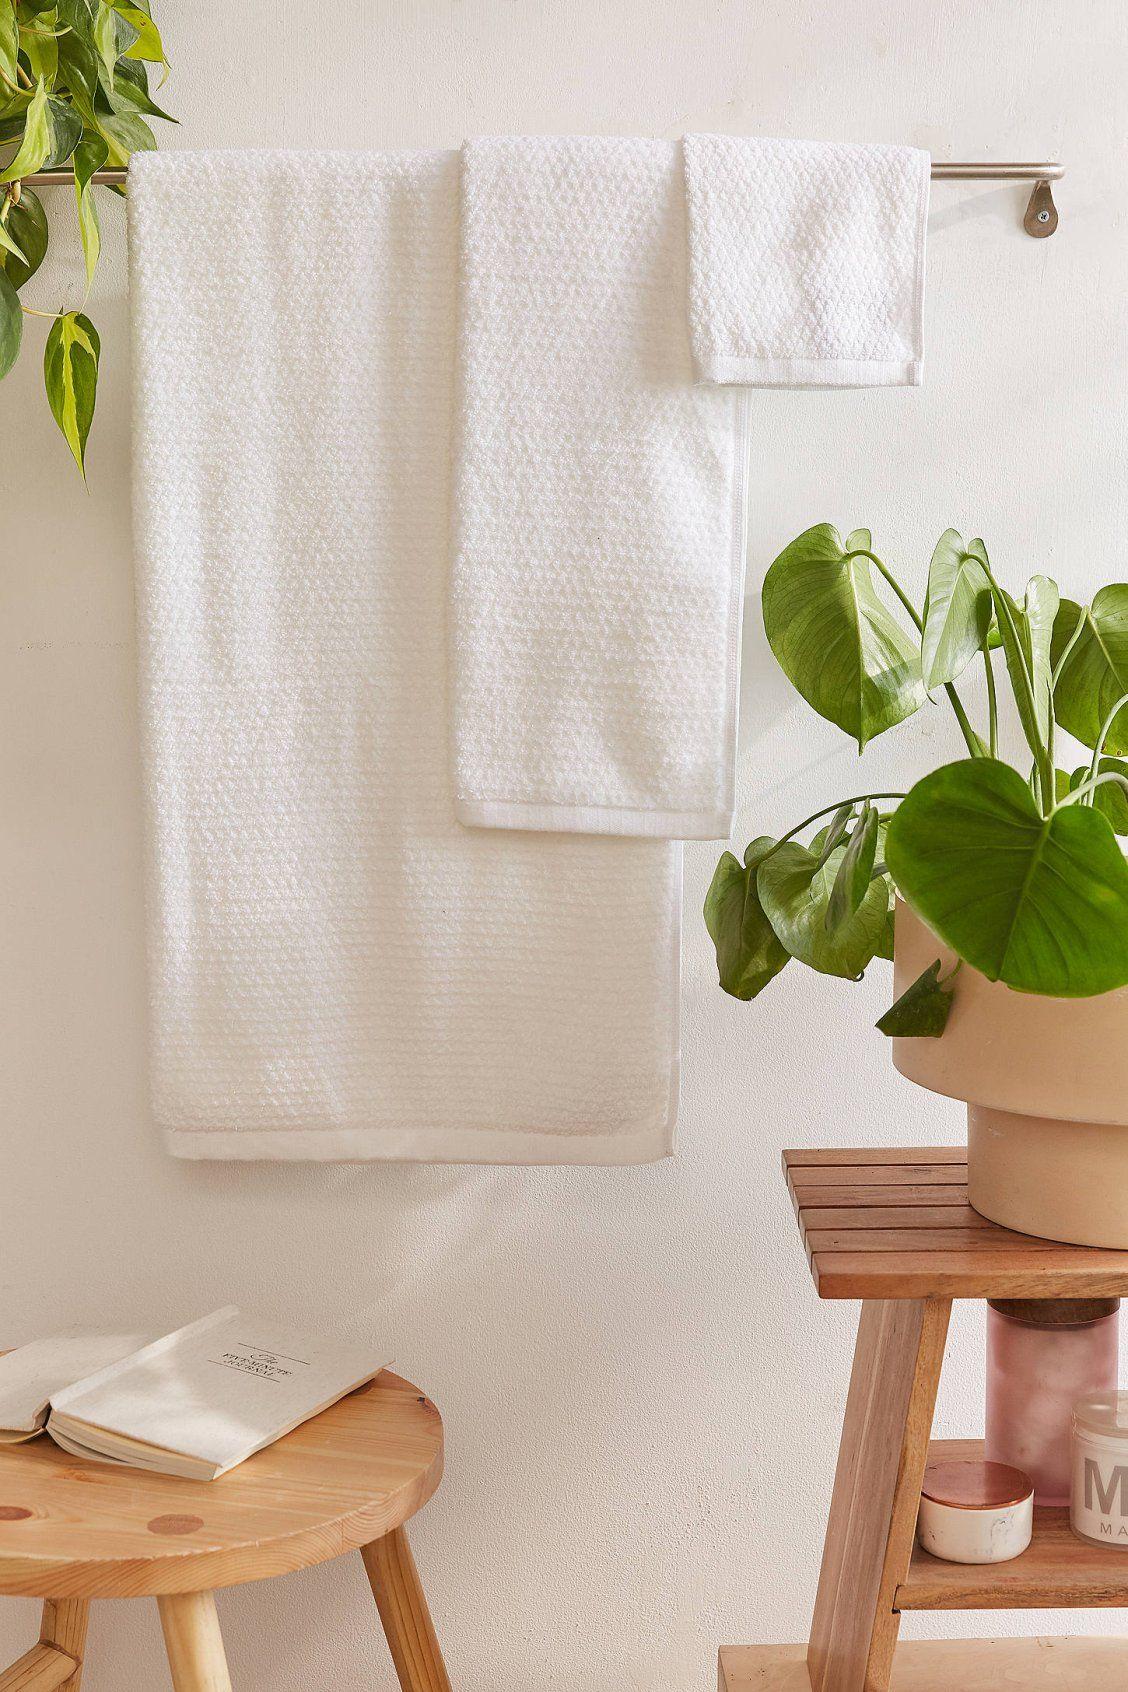 Tufted Diamond Tassel Bath Mat Towel Set Bath Towel Sets Bath Towels